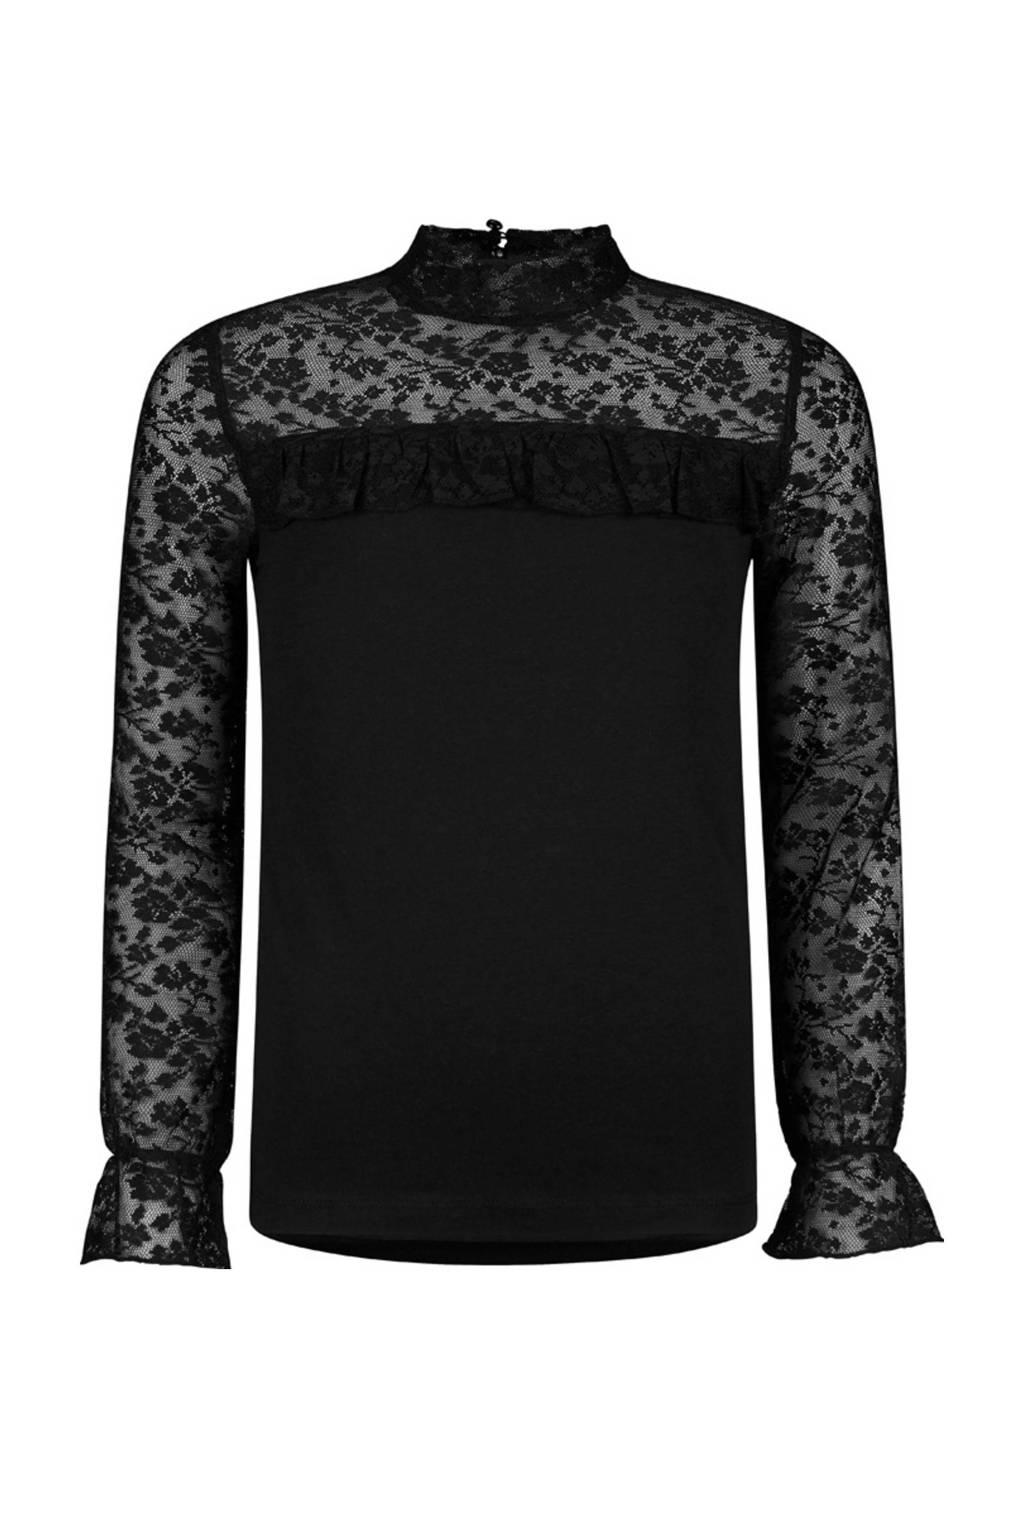 Retour Denim semi-transparante top Phoeby met kant zwart, Zwart